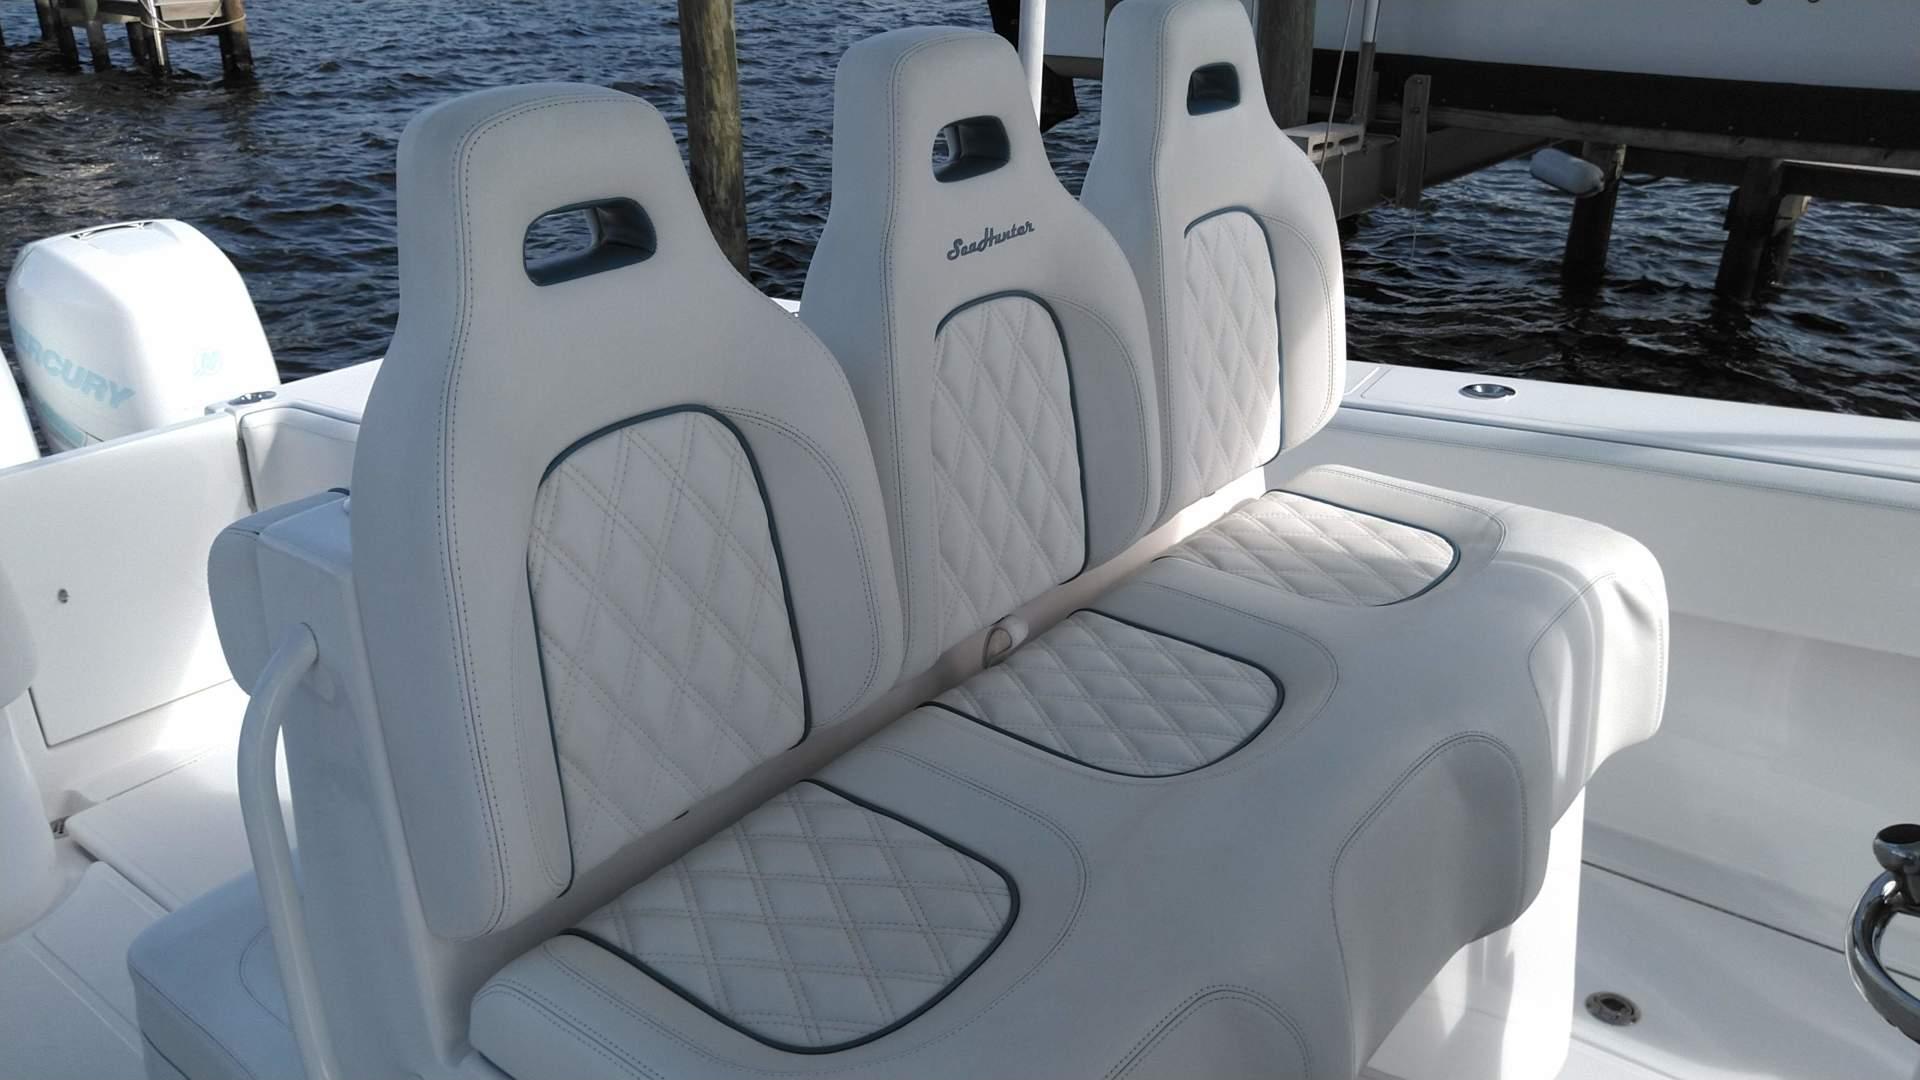 SeaHunter-33 2019 -Jensen Beach-Florida-United States-1562171 | Thumbnail